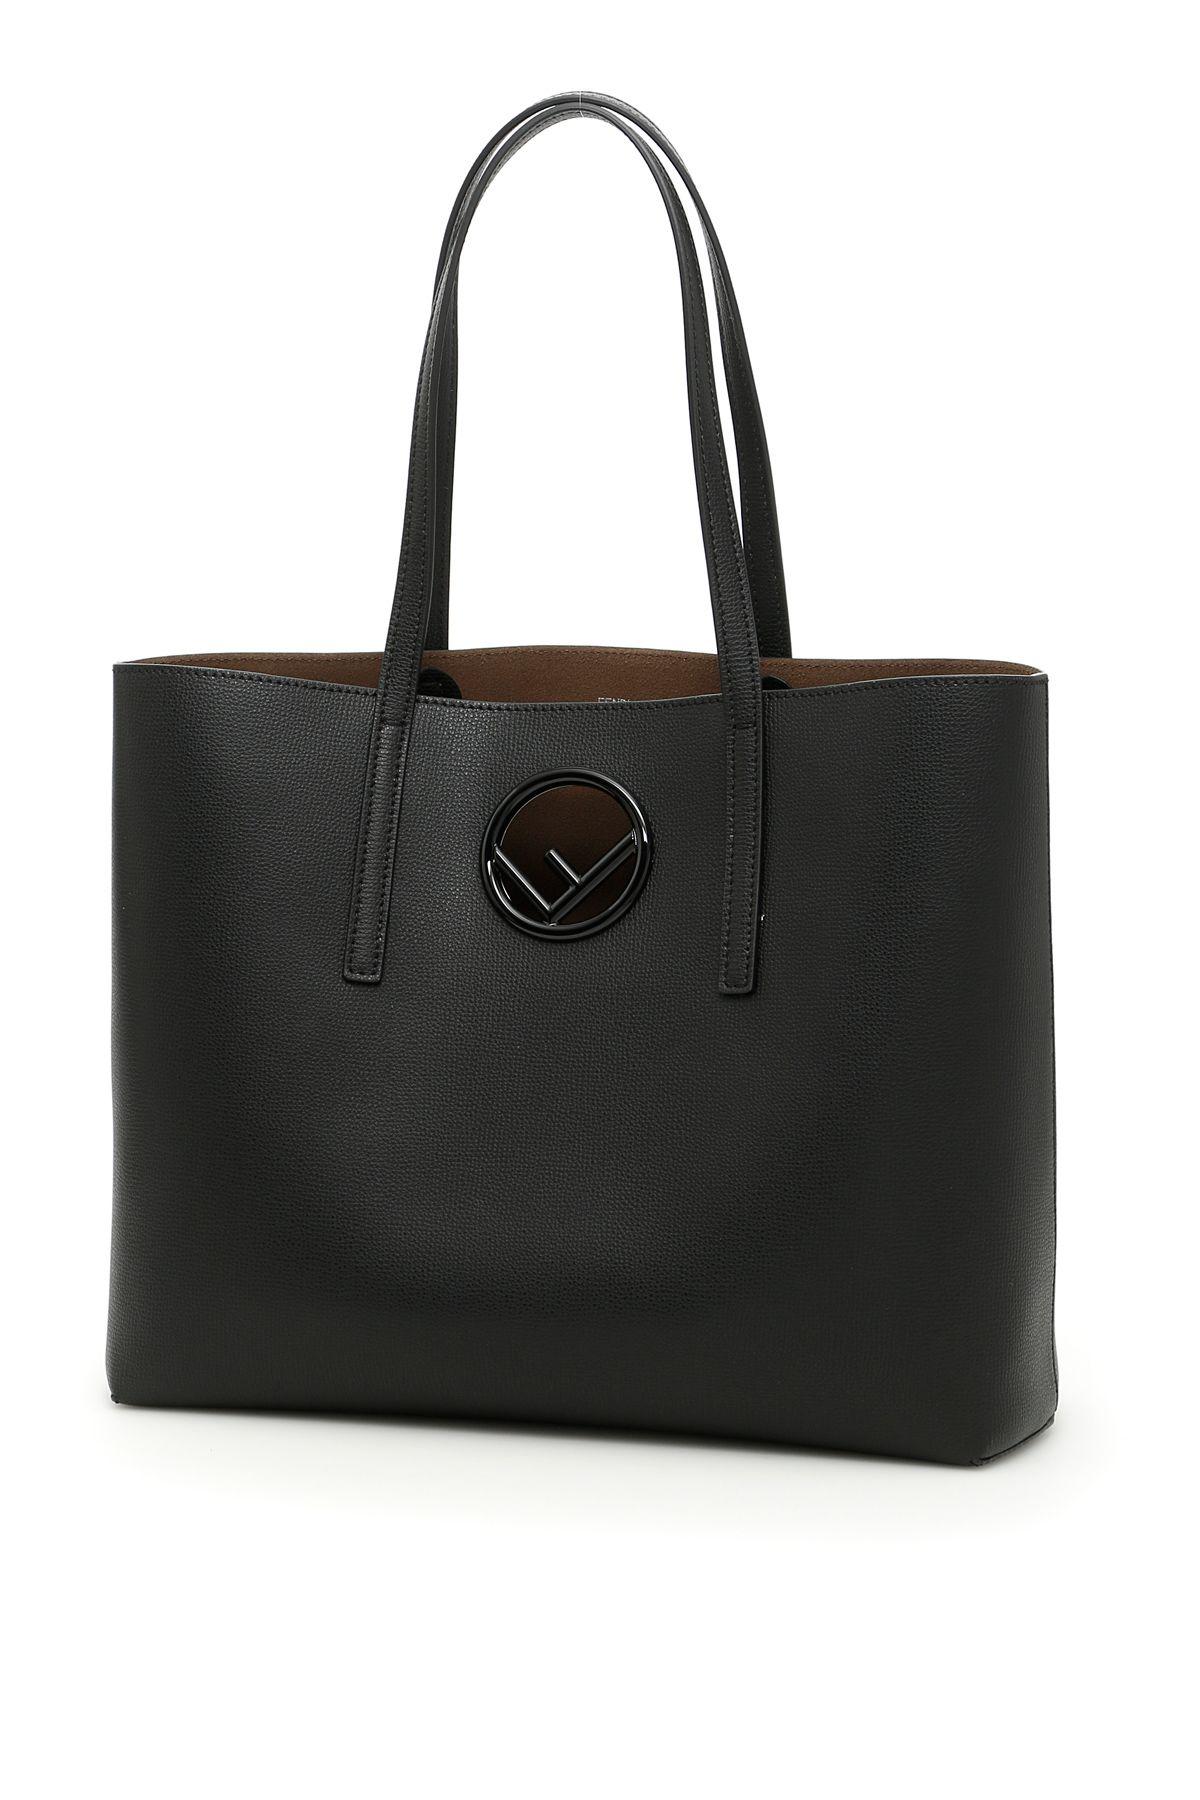 Fendi Vienna Calfskin Logo Shopping Bag